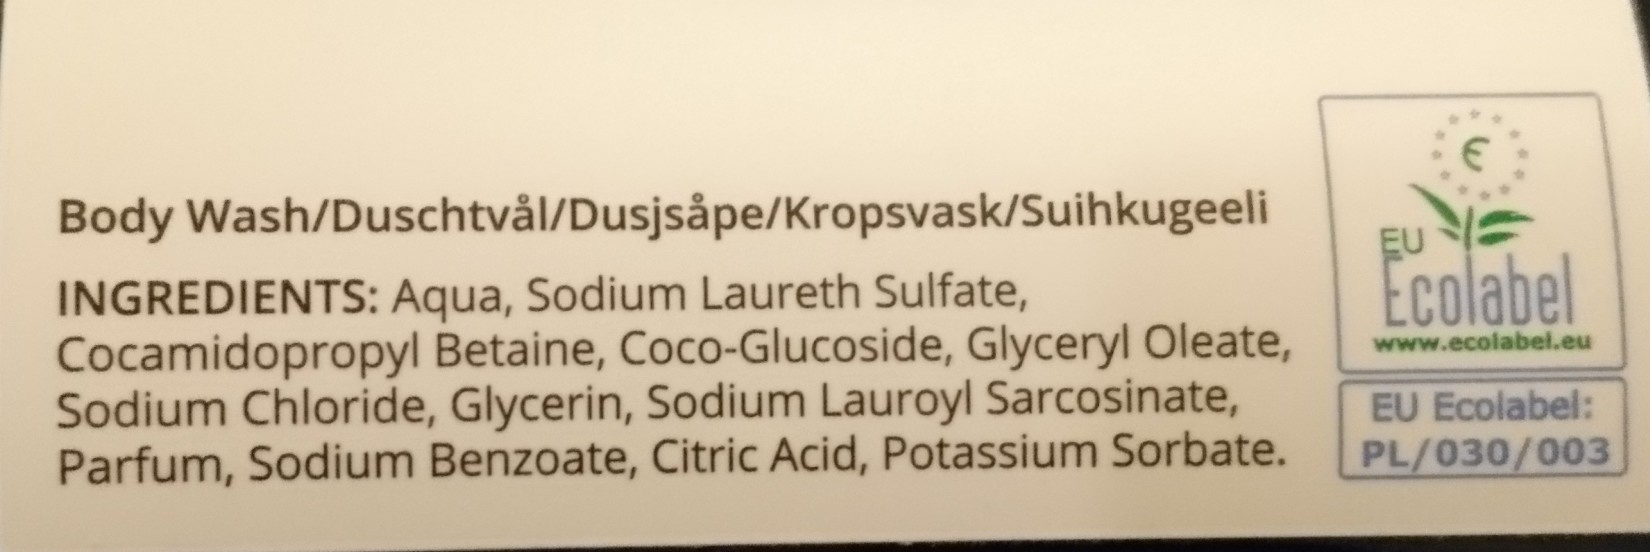 Coconut Milk Body Wash - Ingredients - sv